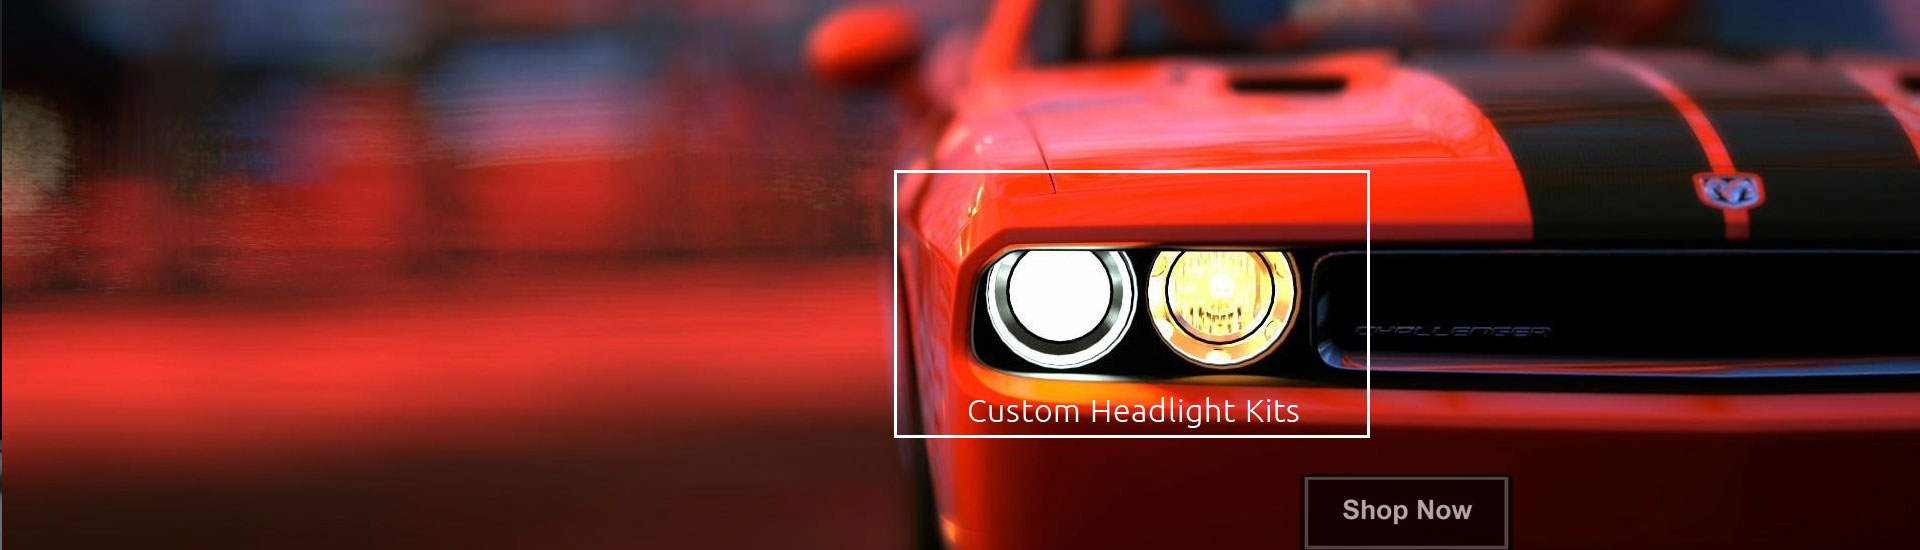 Custom Headlight Kits